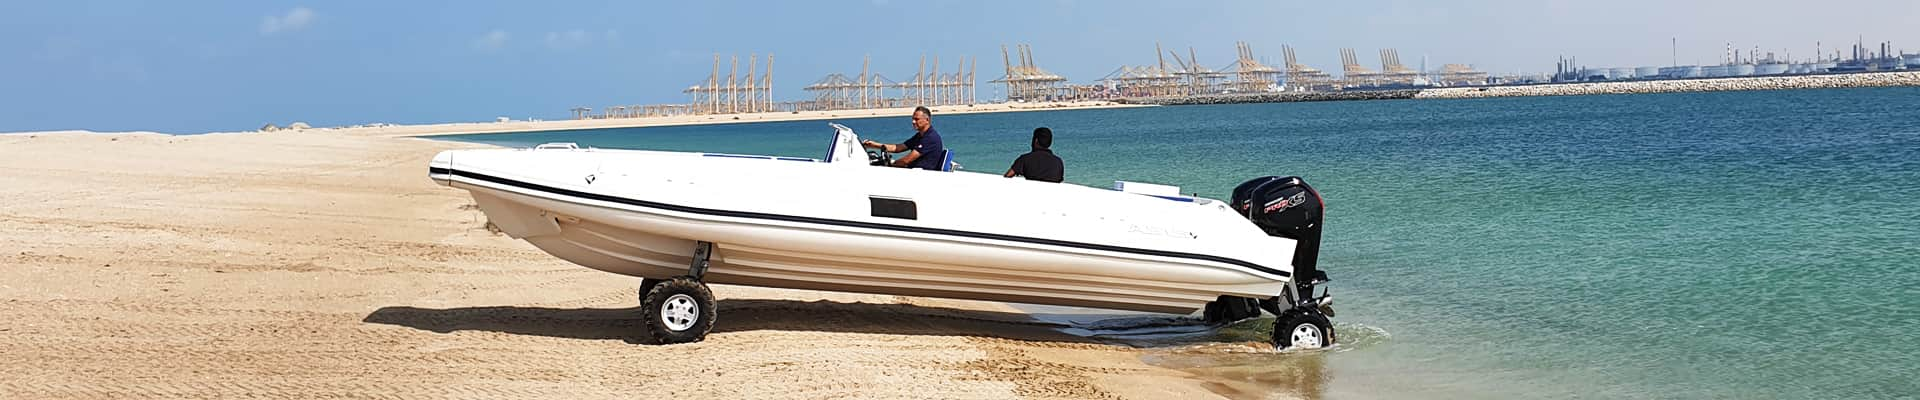 asis-boats-beachlander-9.5m (1)